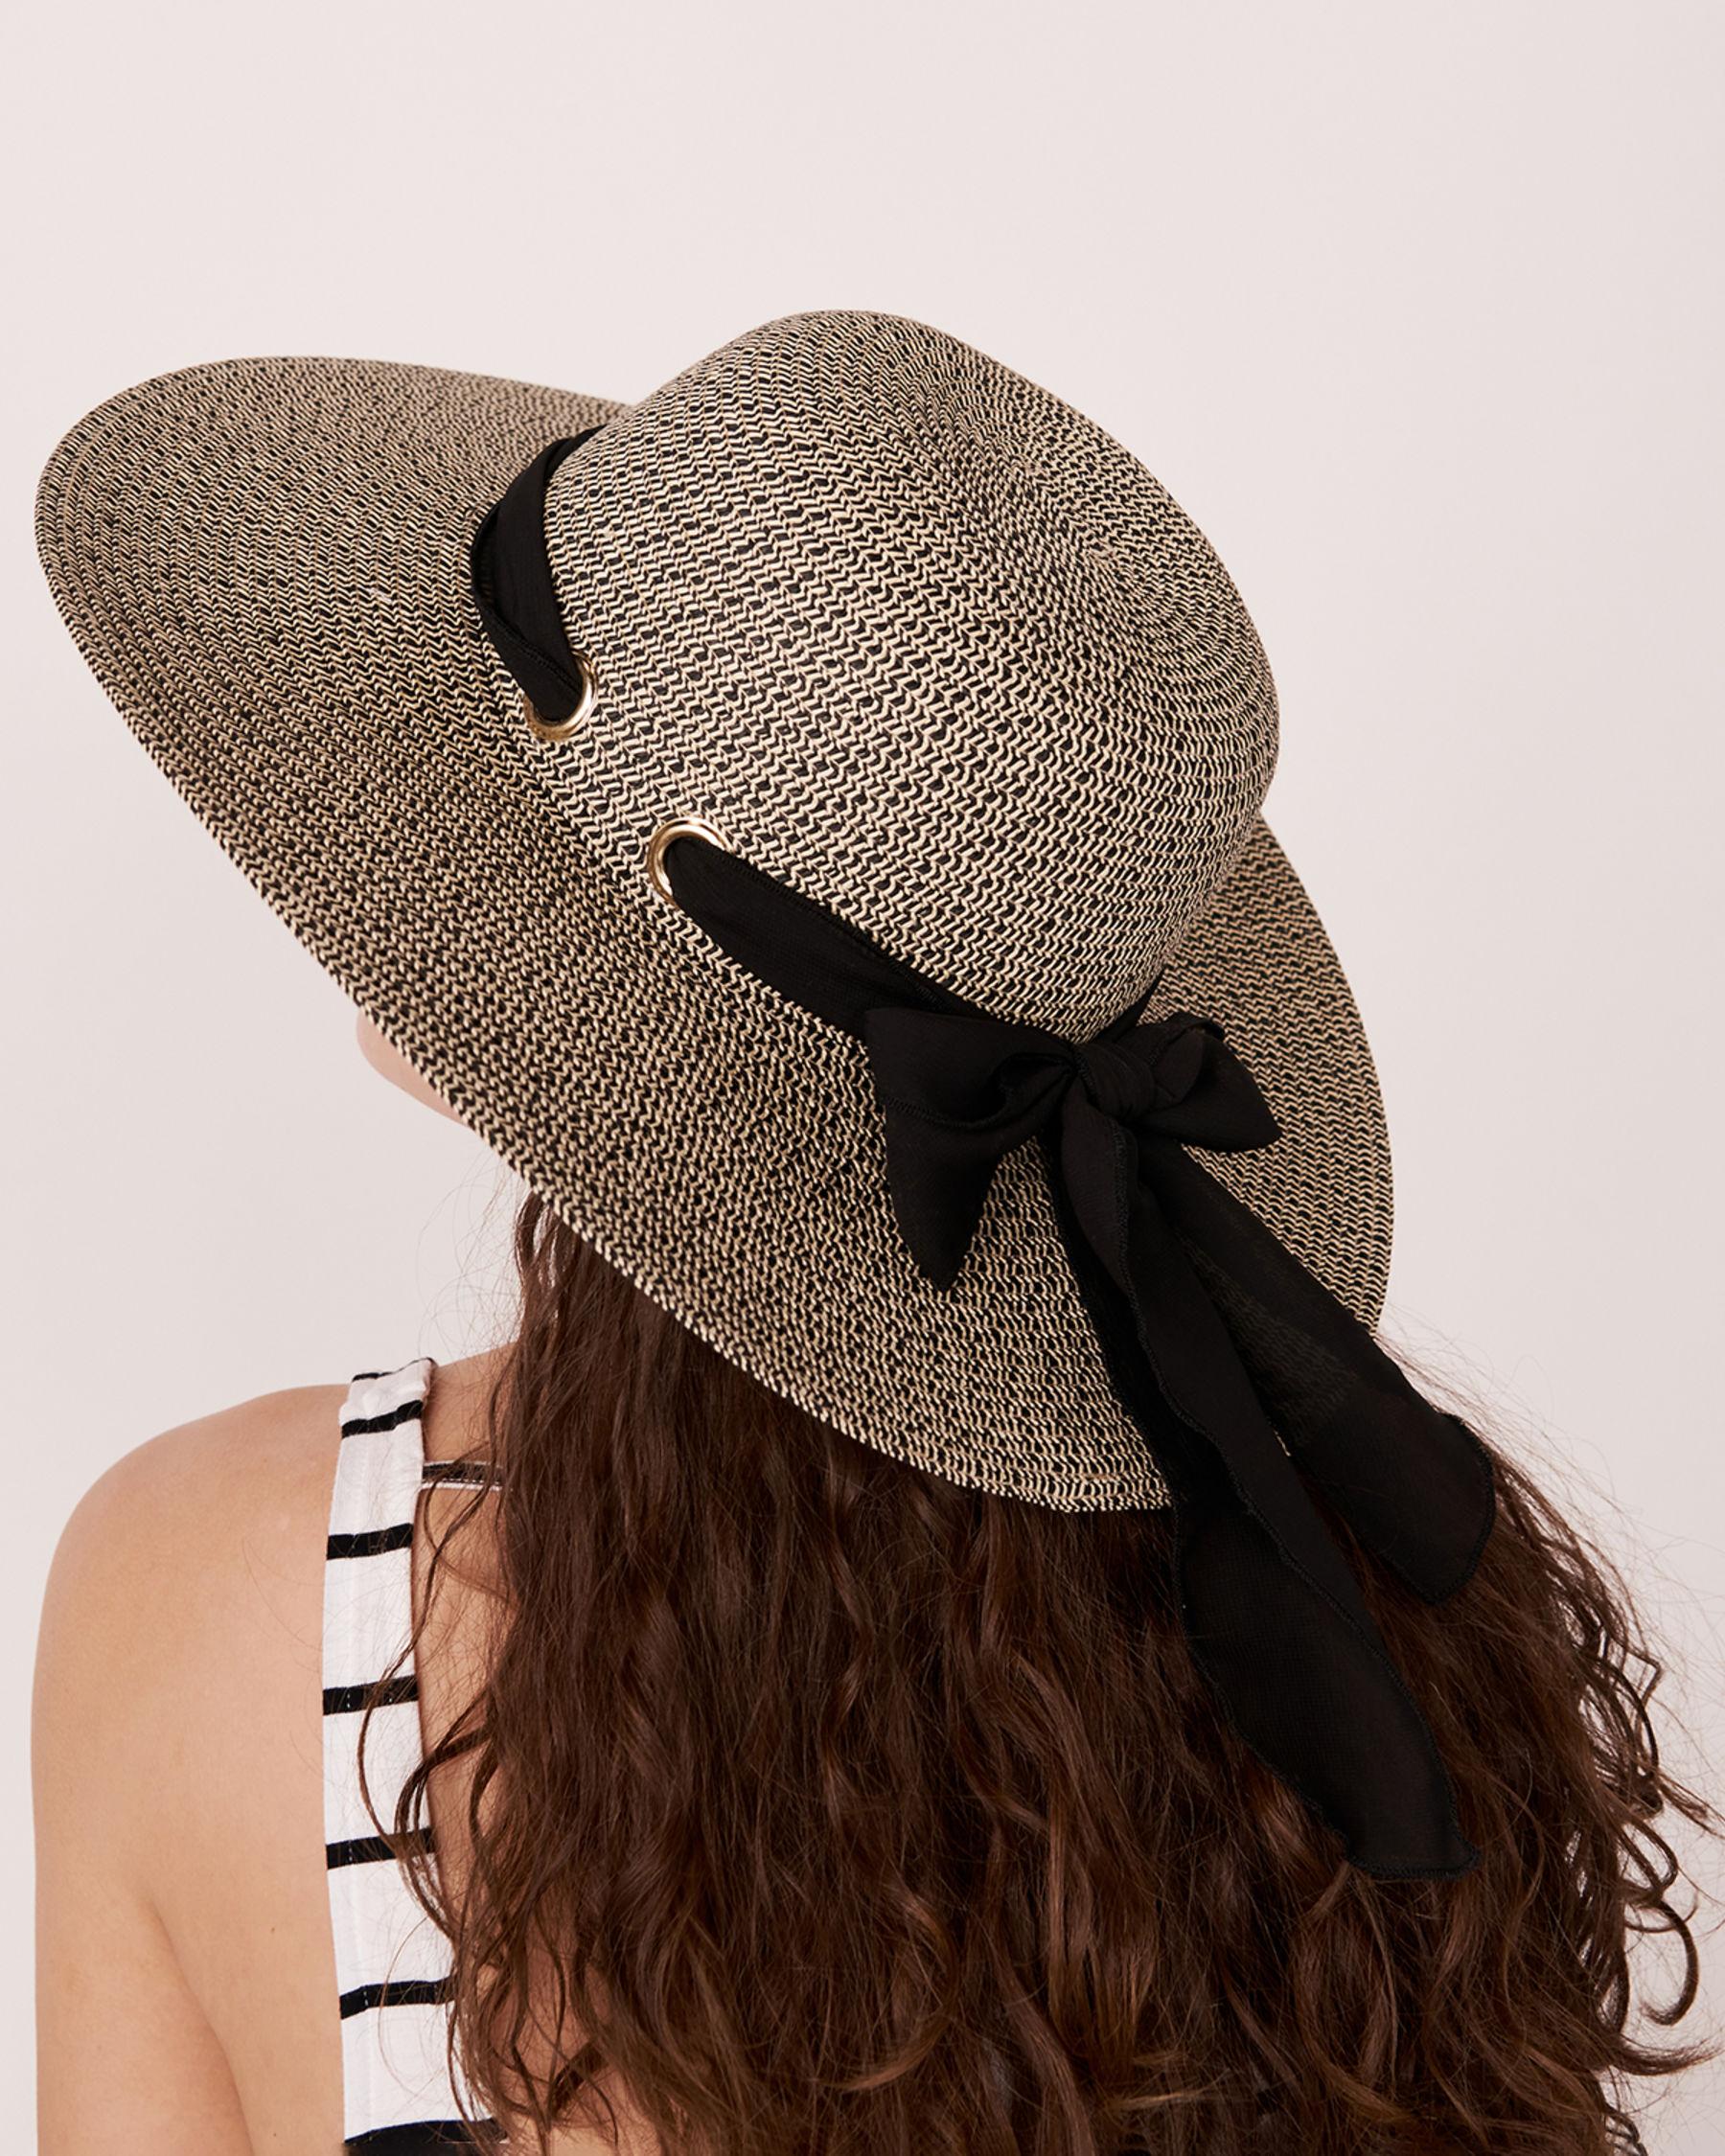 LA VIE EN ROSE AQUA Bow Hat Nude 80500006 - View1